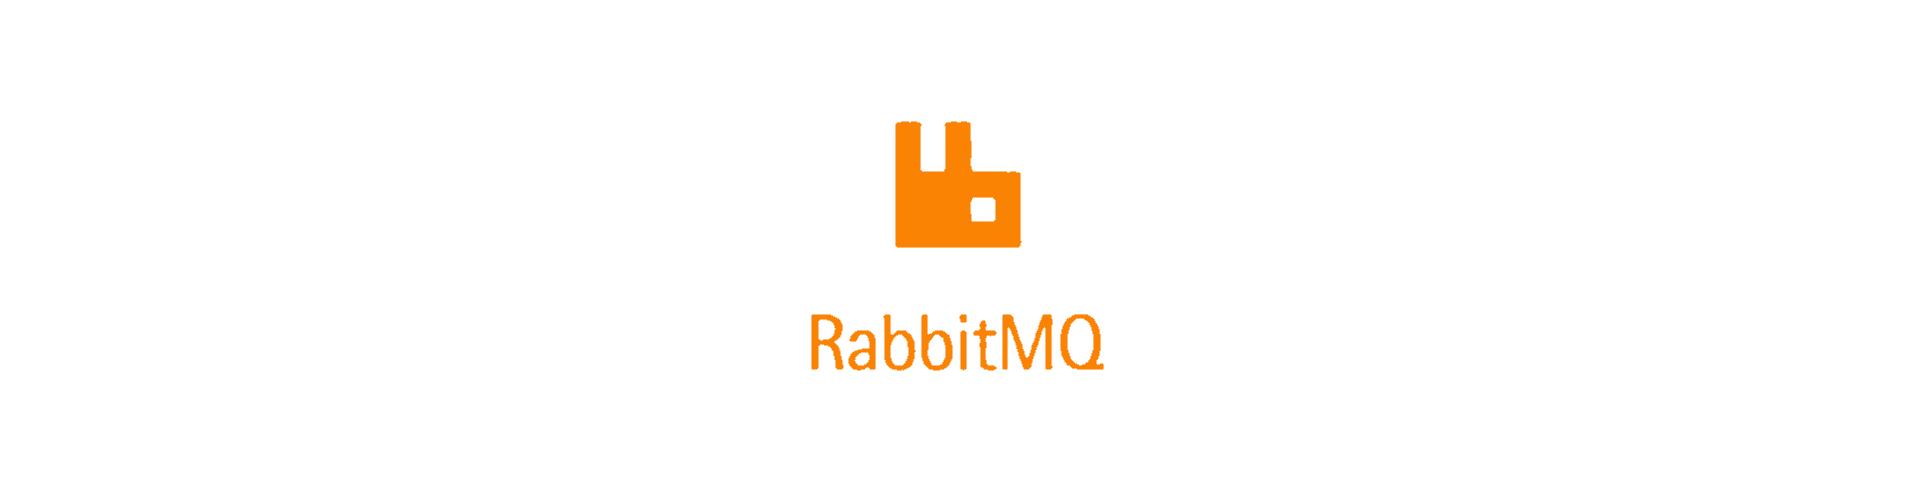 SpringBoot 整合 RabbitMQ